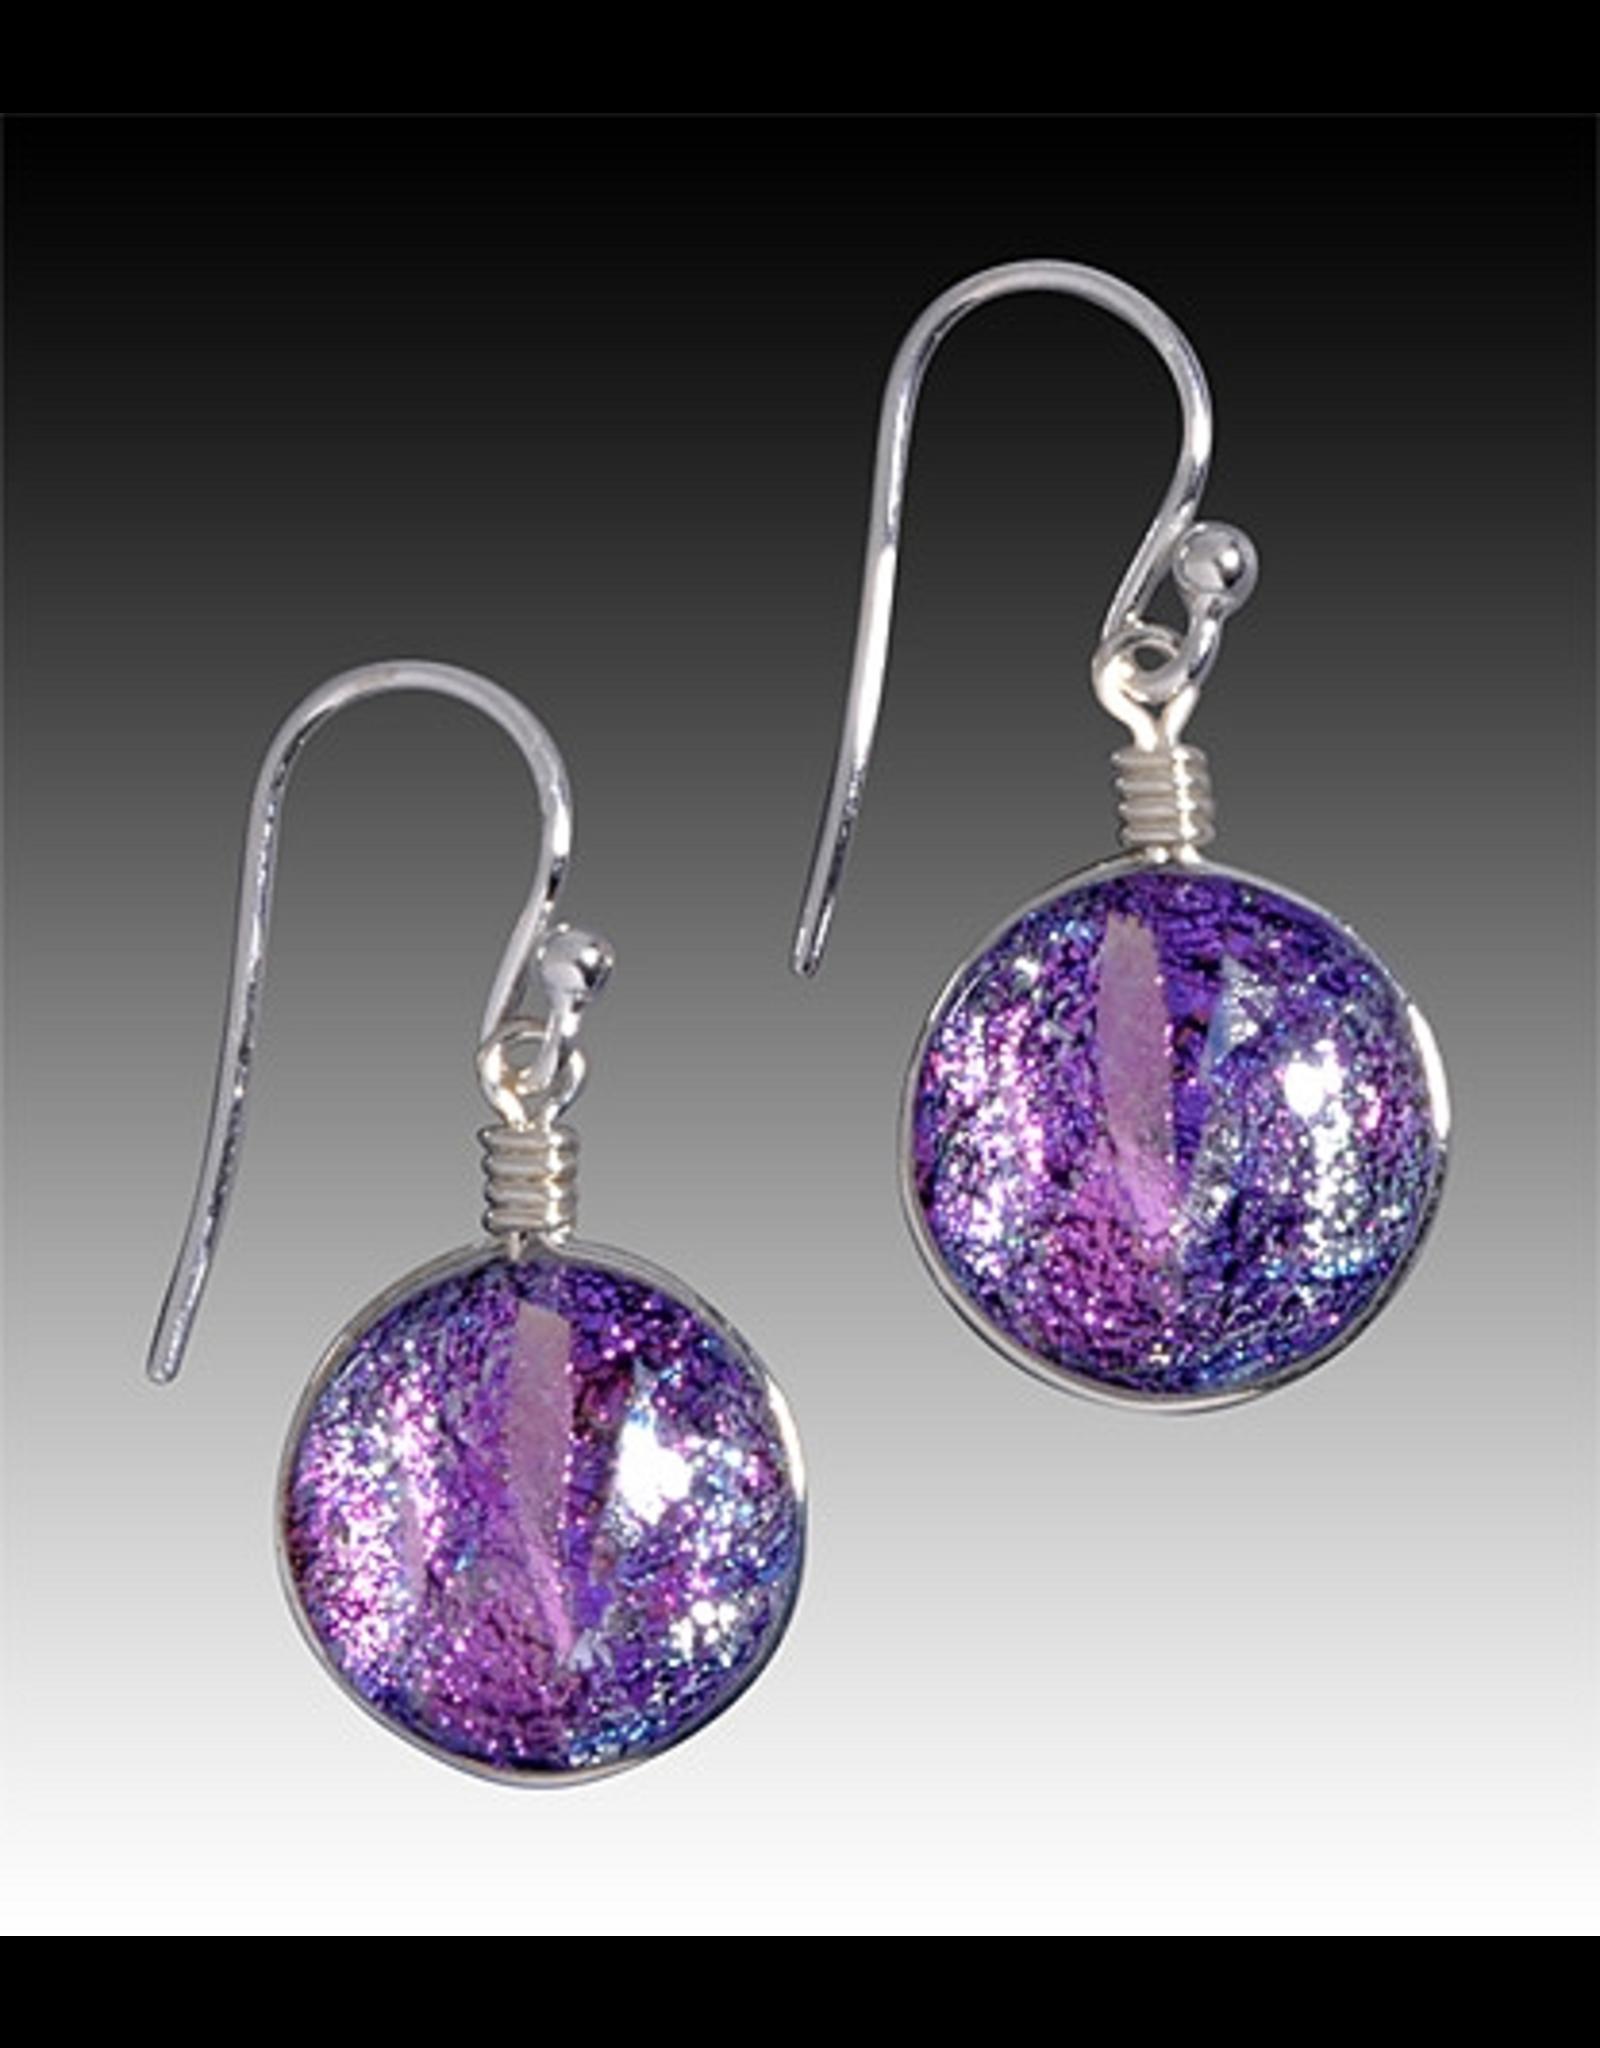 Renaissance Glass VENUS EARRINGS (Dichroic Art Glass, Assorted Colors, #297)